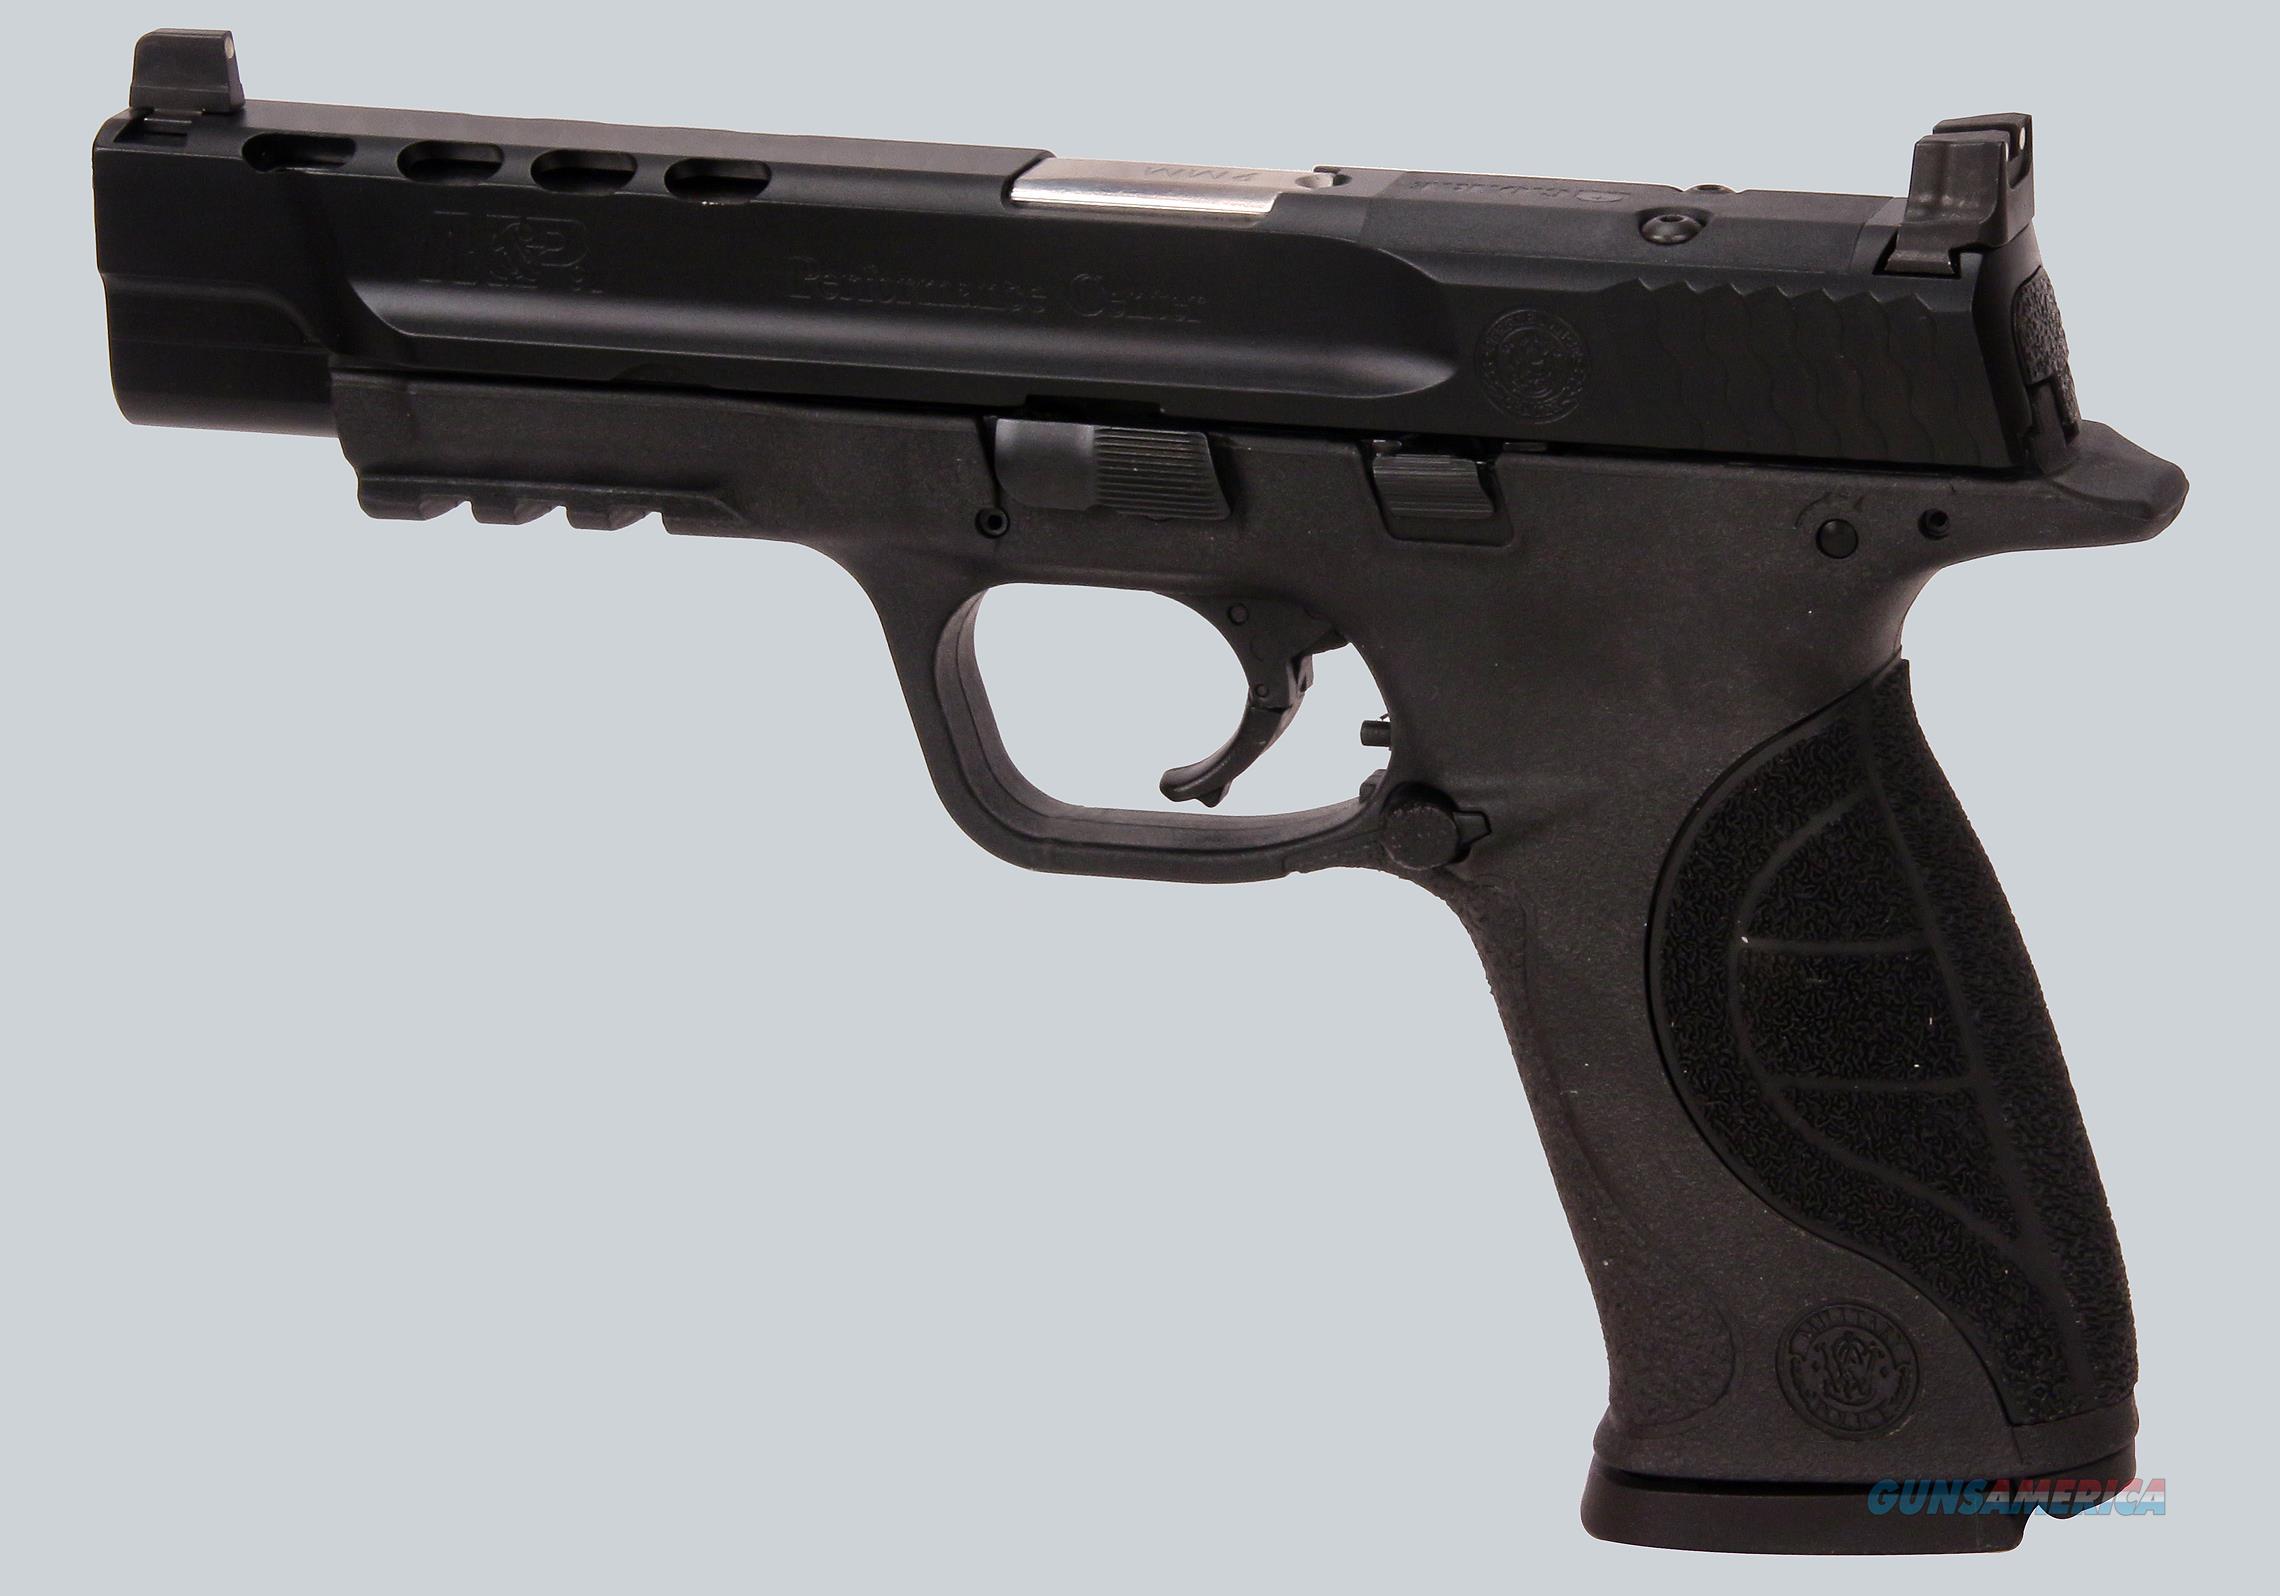 Smith & Wesson 9mm M&P 9L Pistol  Guns > Pistols > Smith & Wesson Pistols - Autos > Polymer Frame